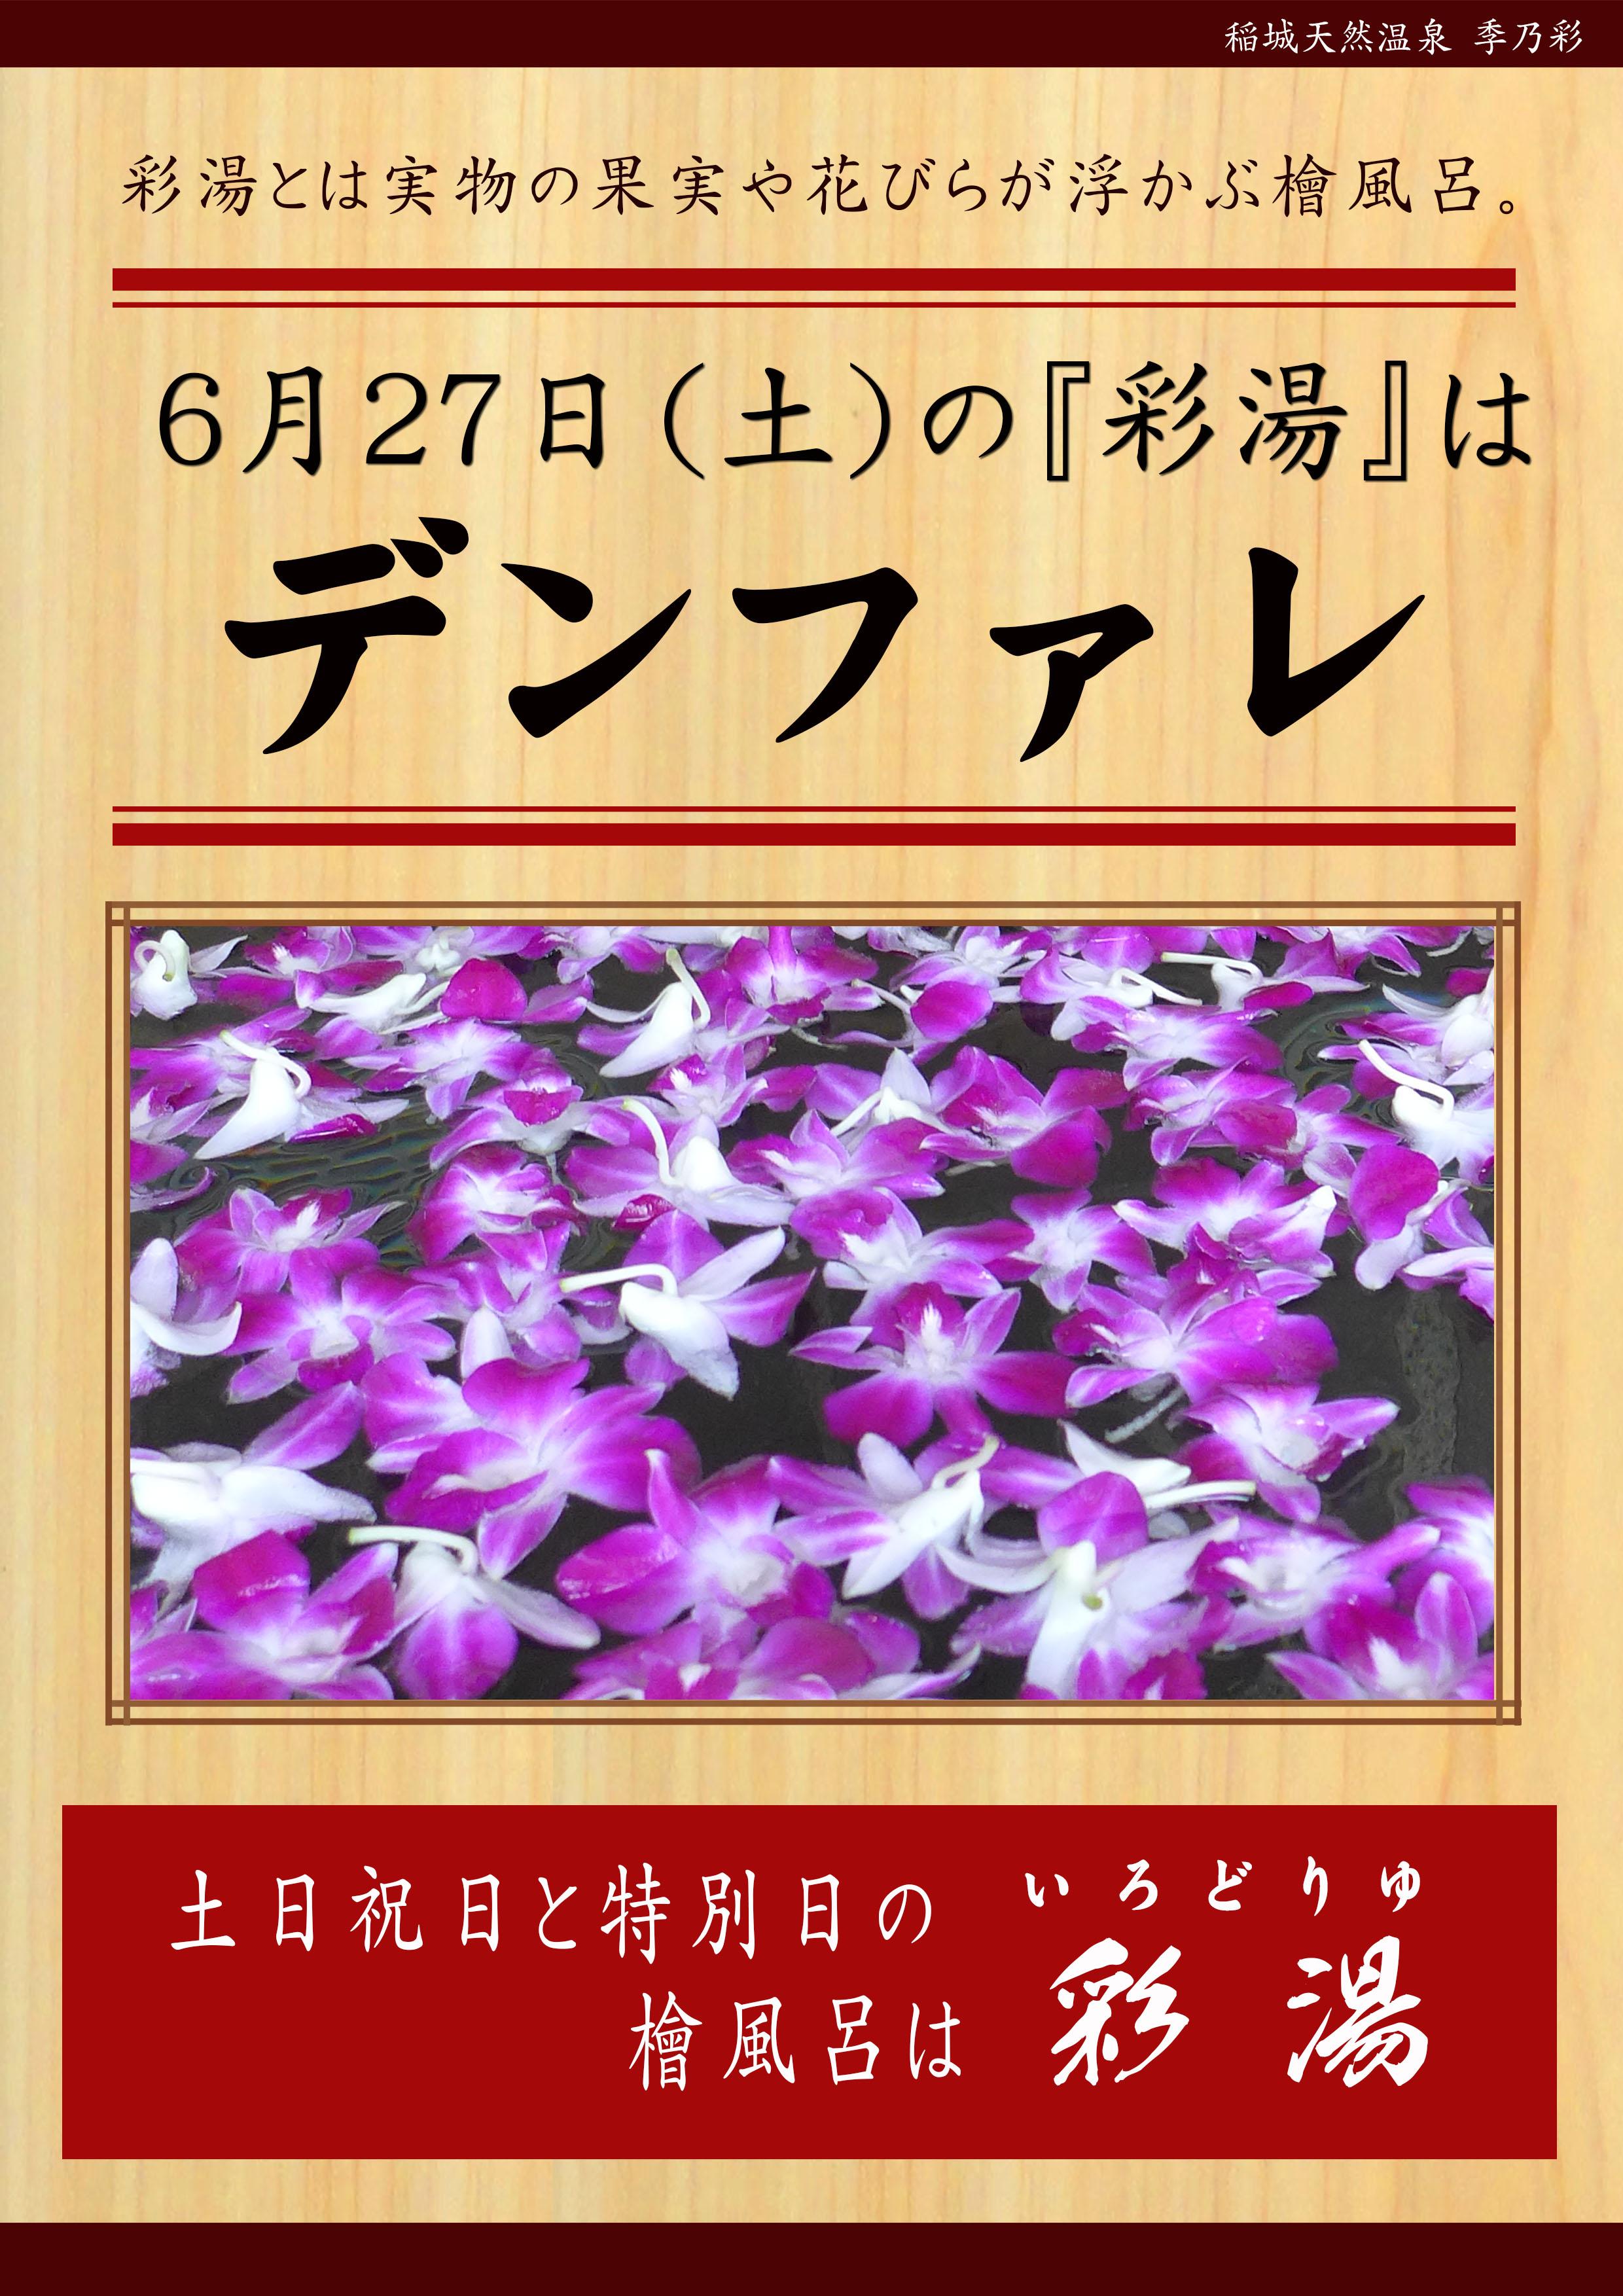 200627 POP イベント 彩湯 男女湯 デンファレ